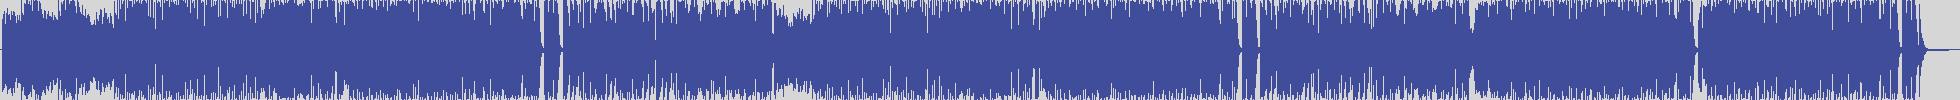 smilax_dig_records [Smilax_X448DIG] Stefy - Katalicammello [Original Mix] audio wave form